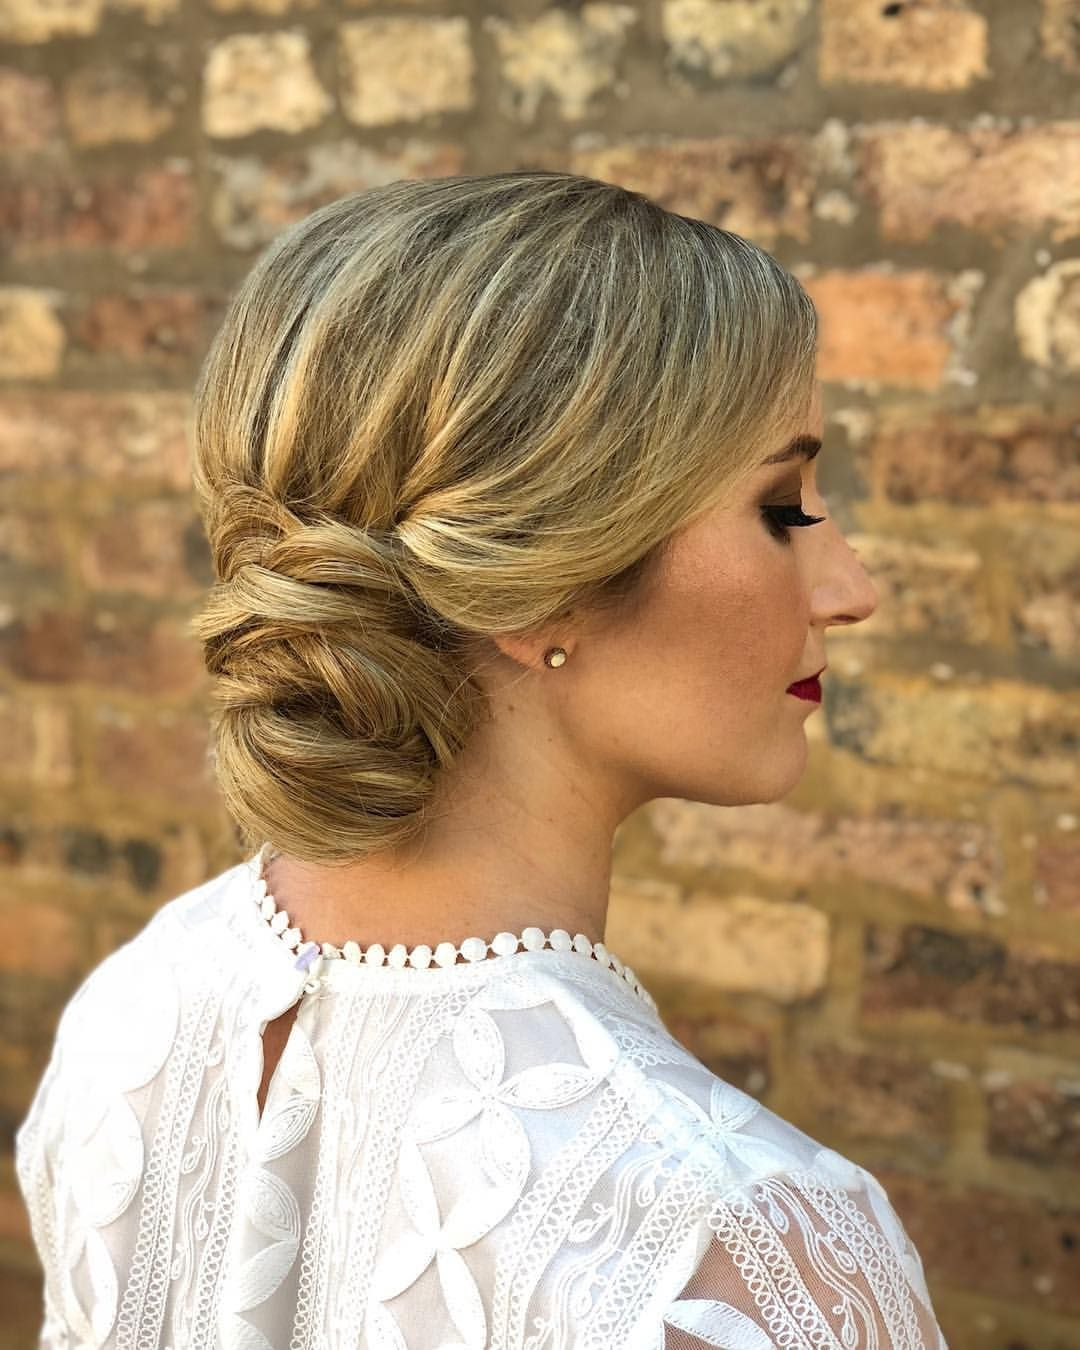 Bridal trial files dreamy art deco wedding updo hairstyle